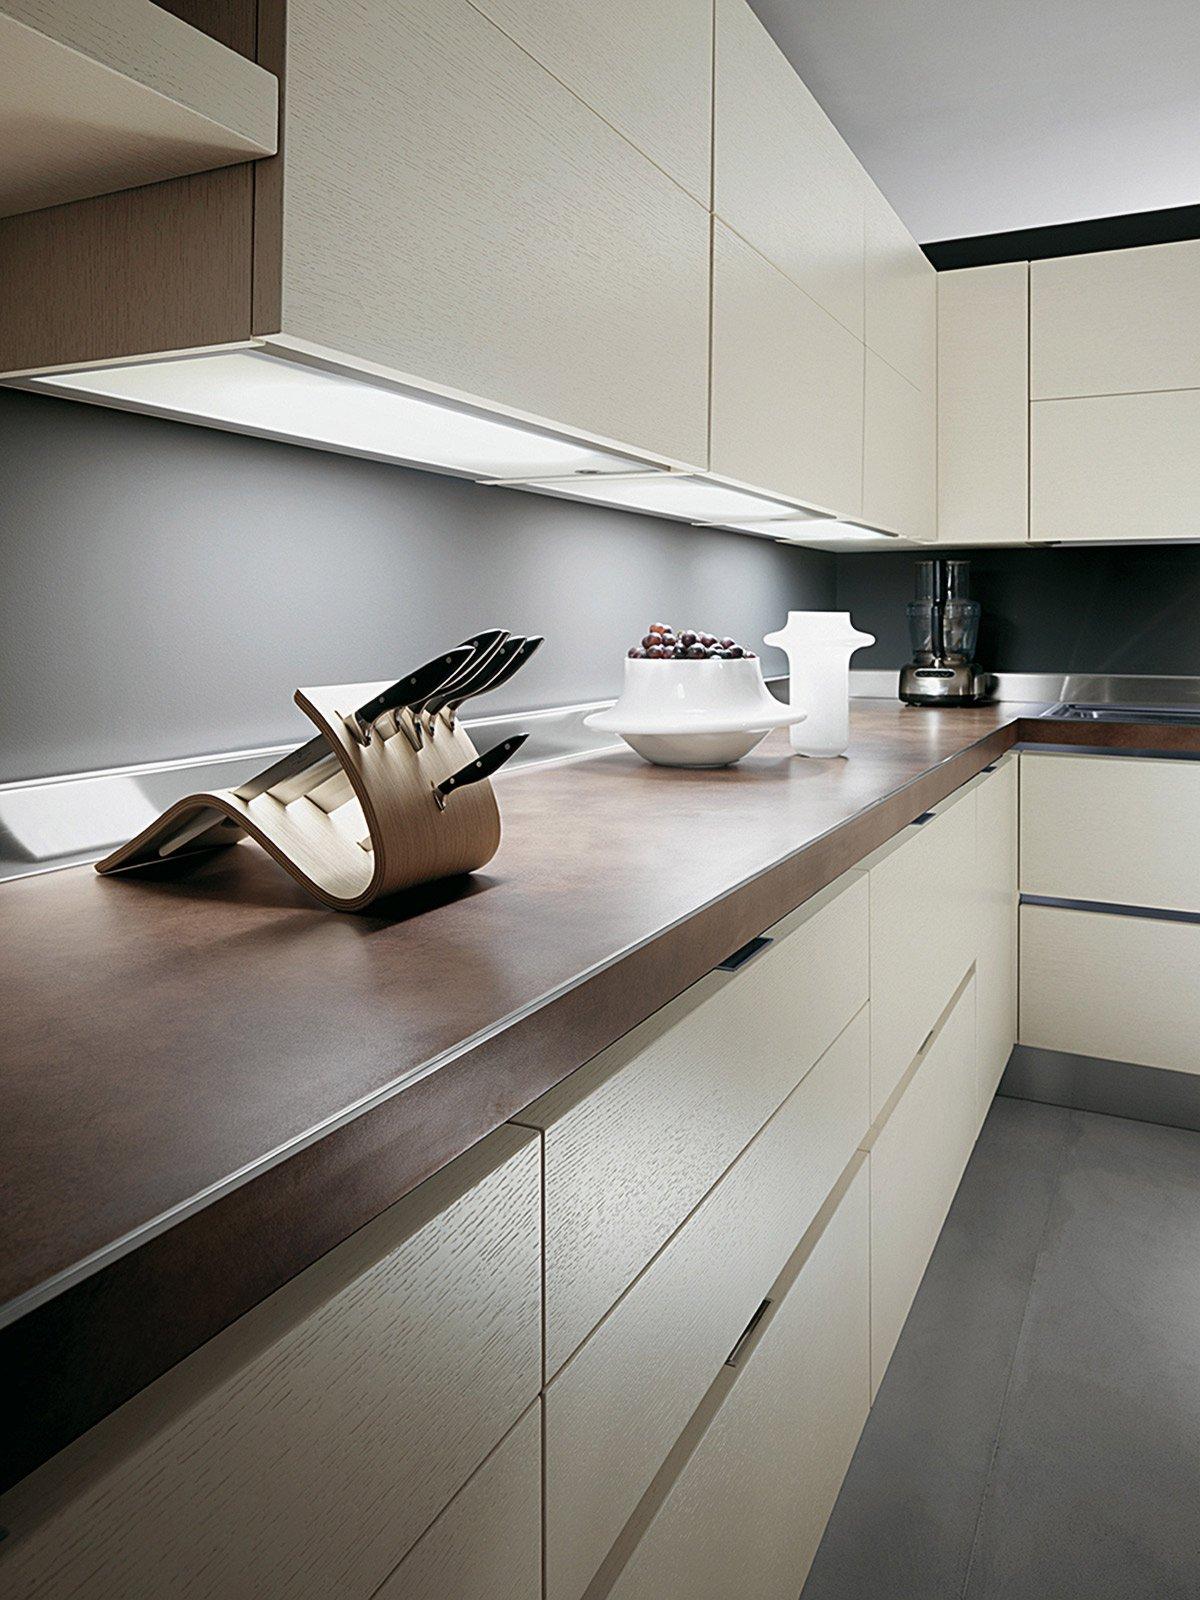 Cucina tante soluzioni per illuminarla cose di casa - Profondita pensili cucina ...